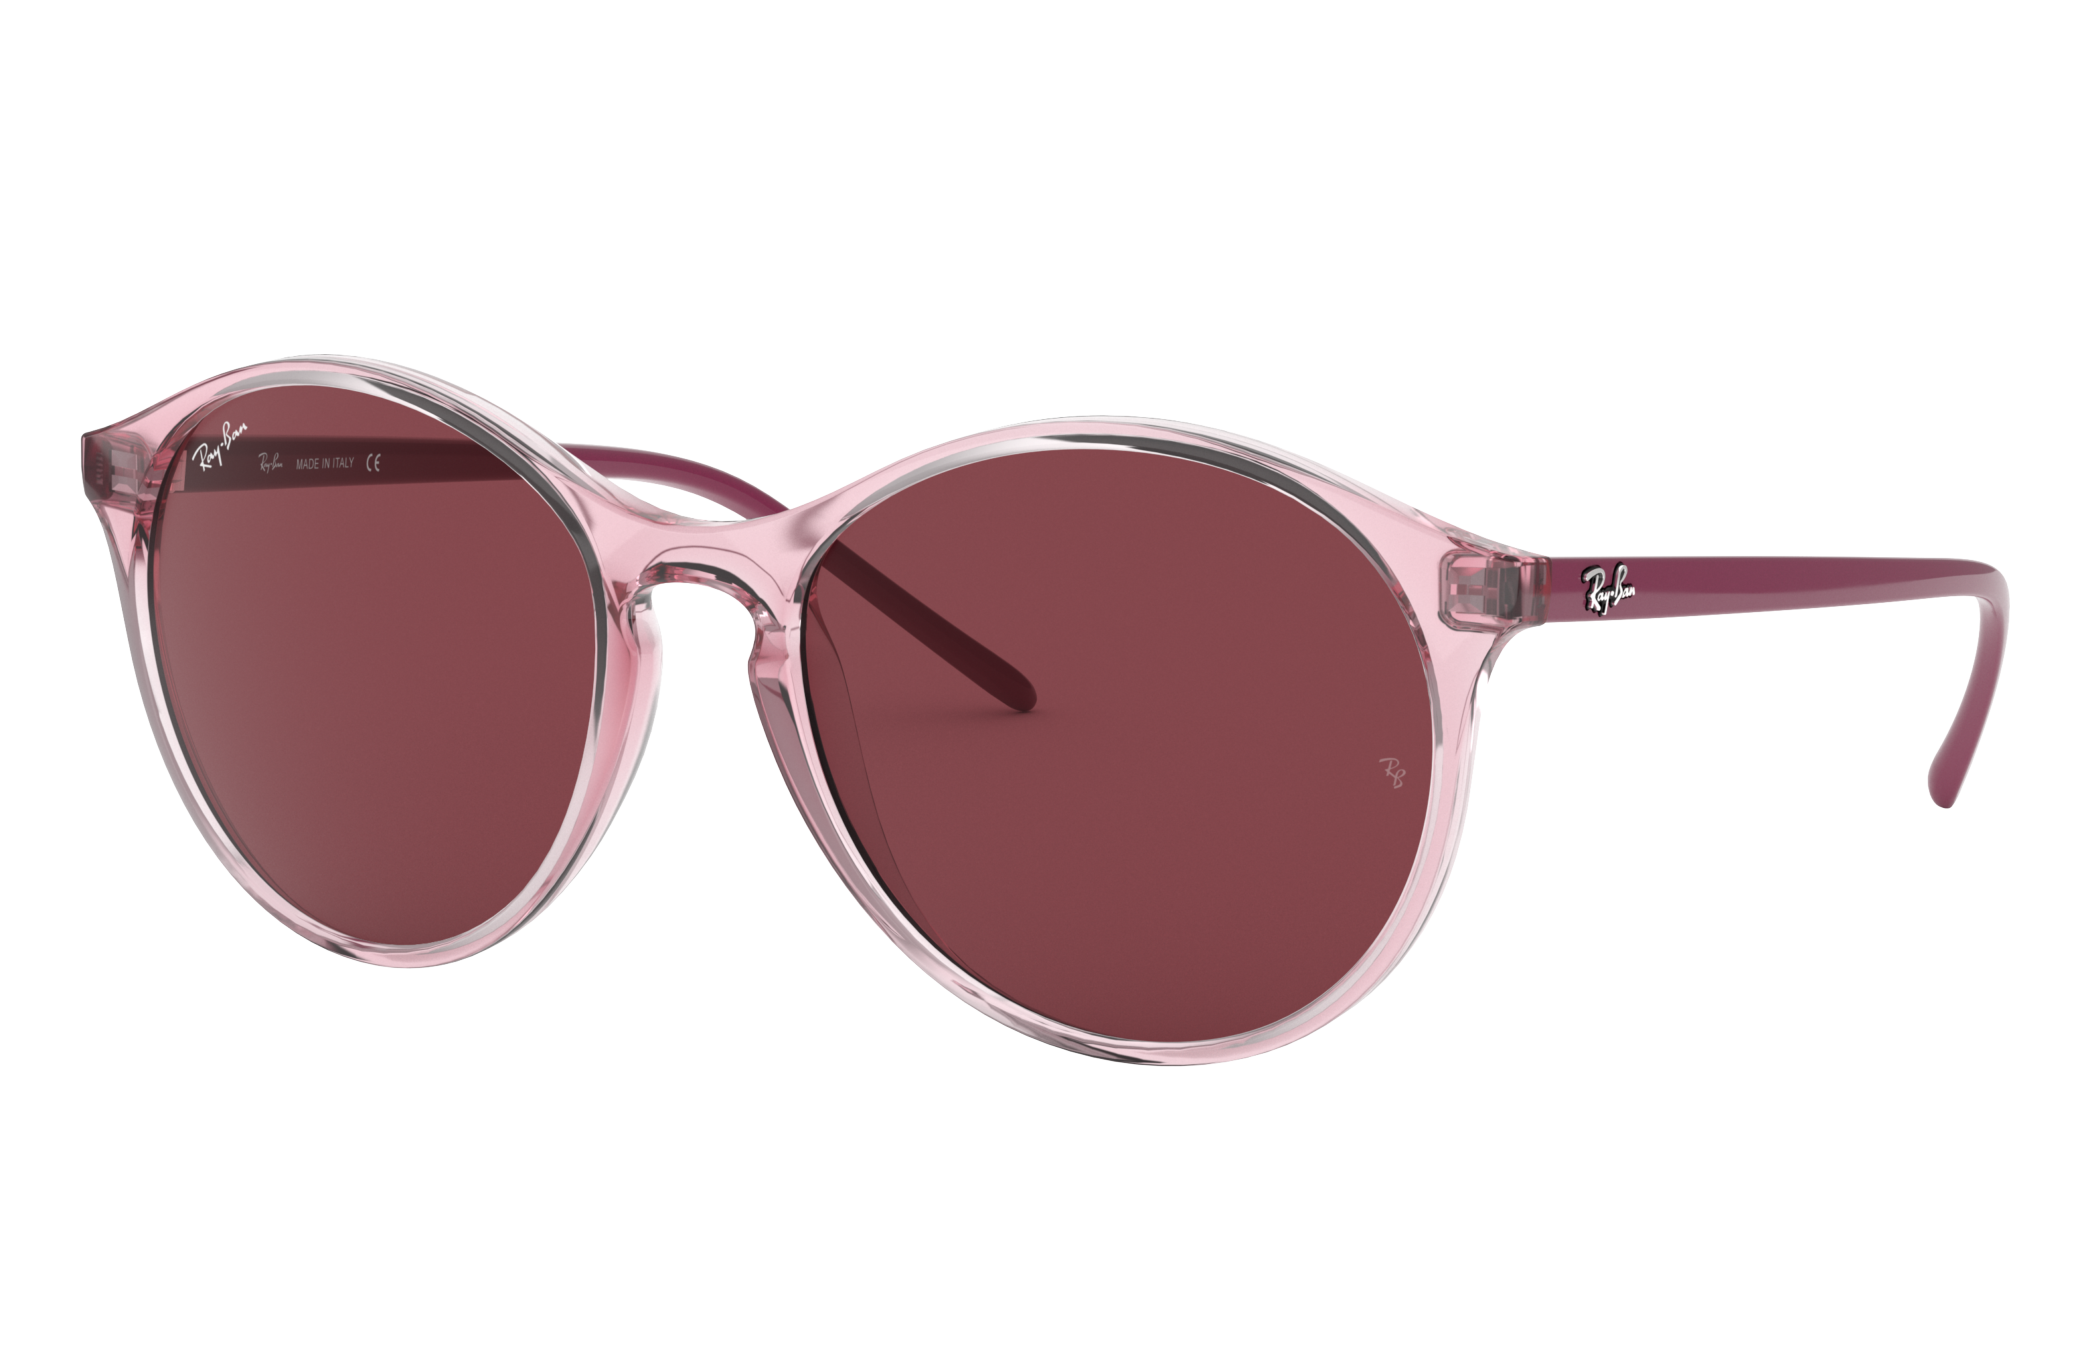 Ray-Ban Rb4371 Pink, Violet Lenses - RB4371